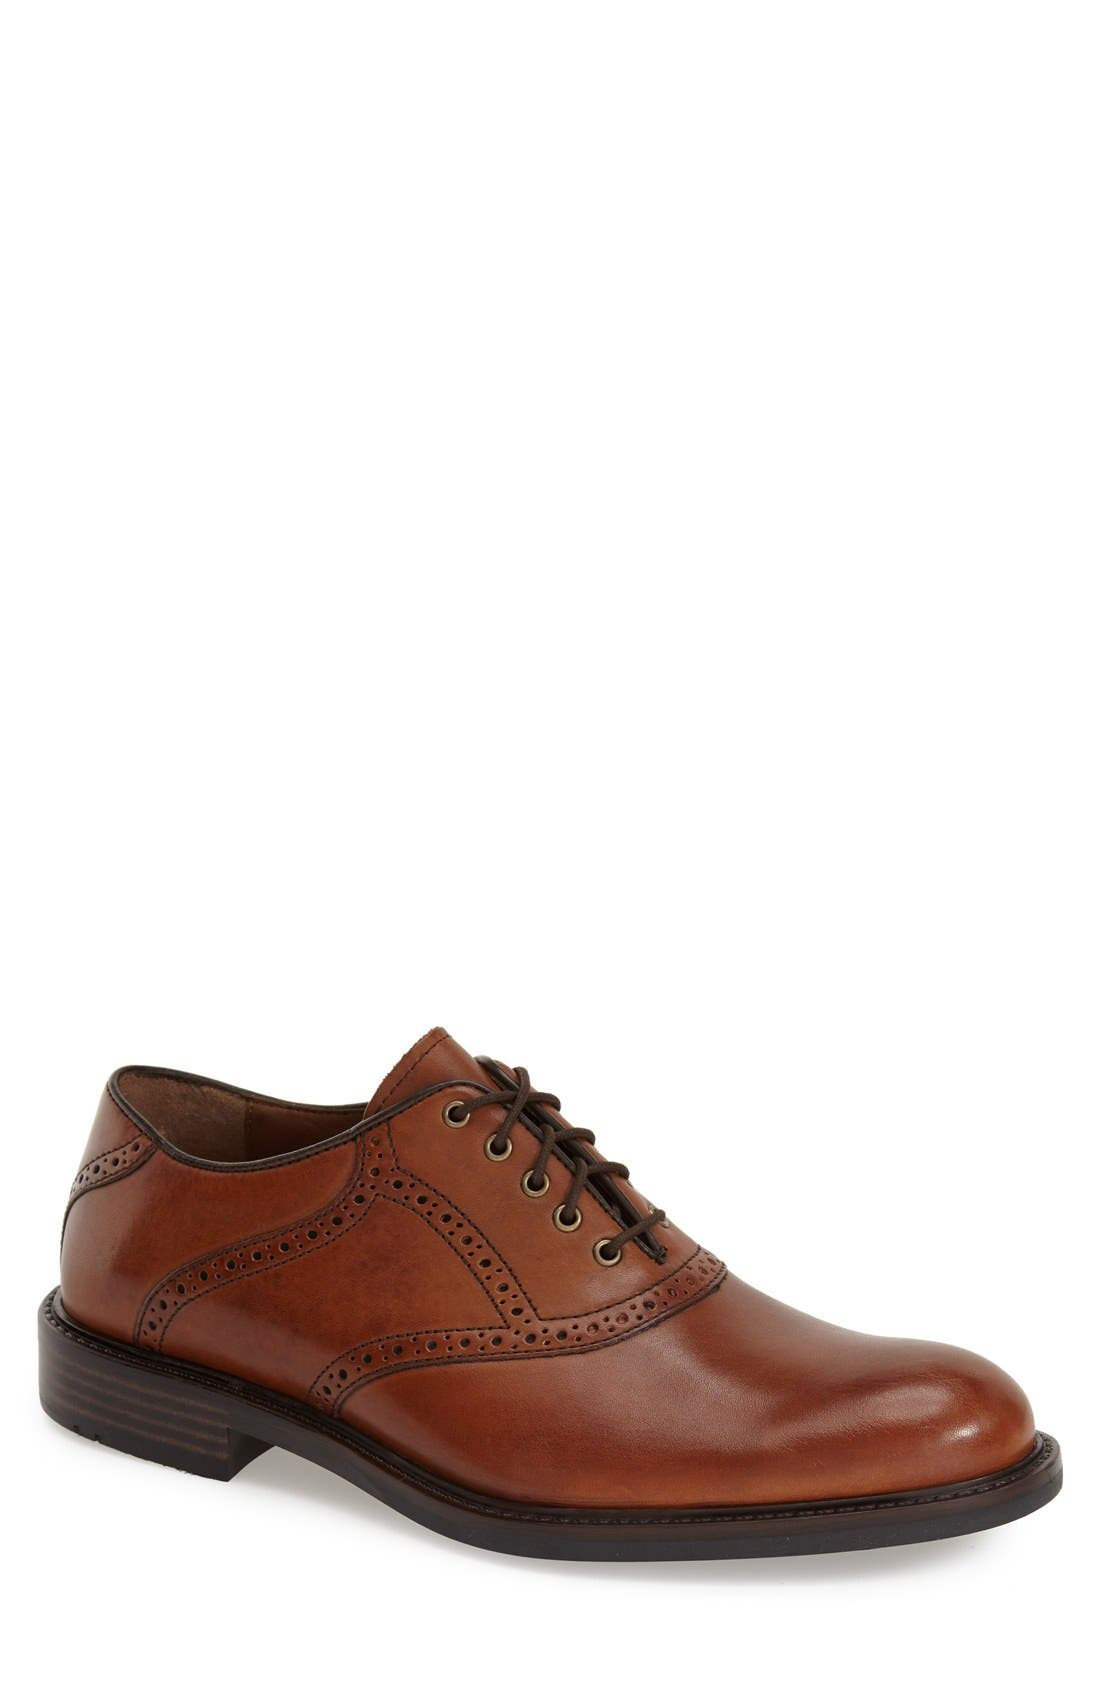 'Tabor' Saddle Shoe,                         Main,                         color, Mahogany